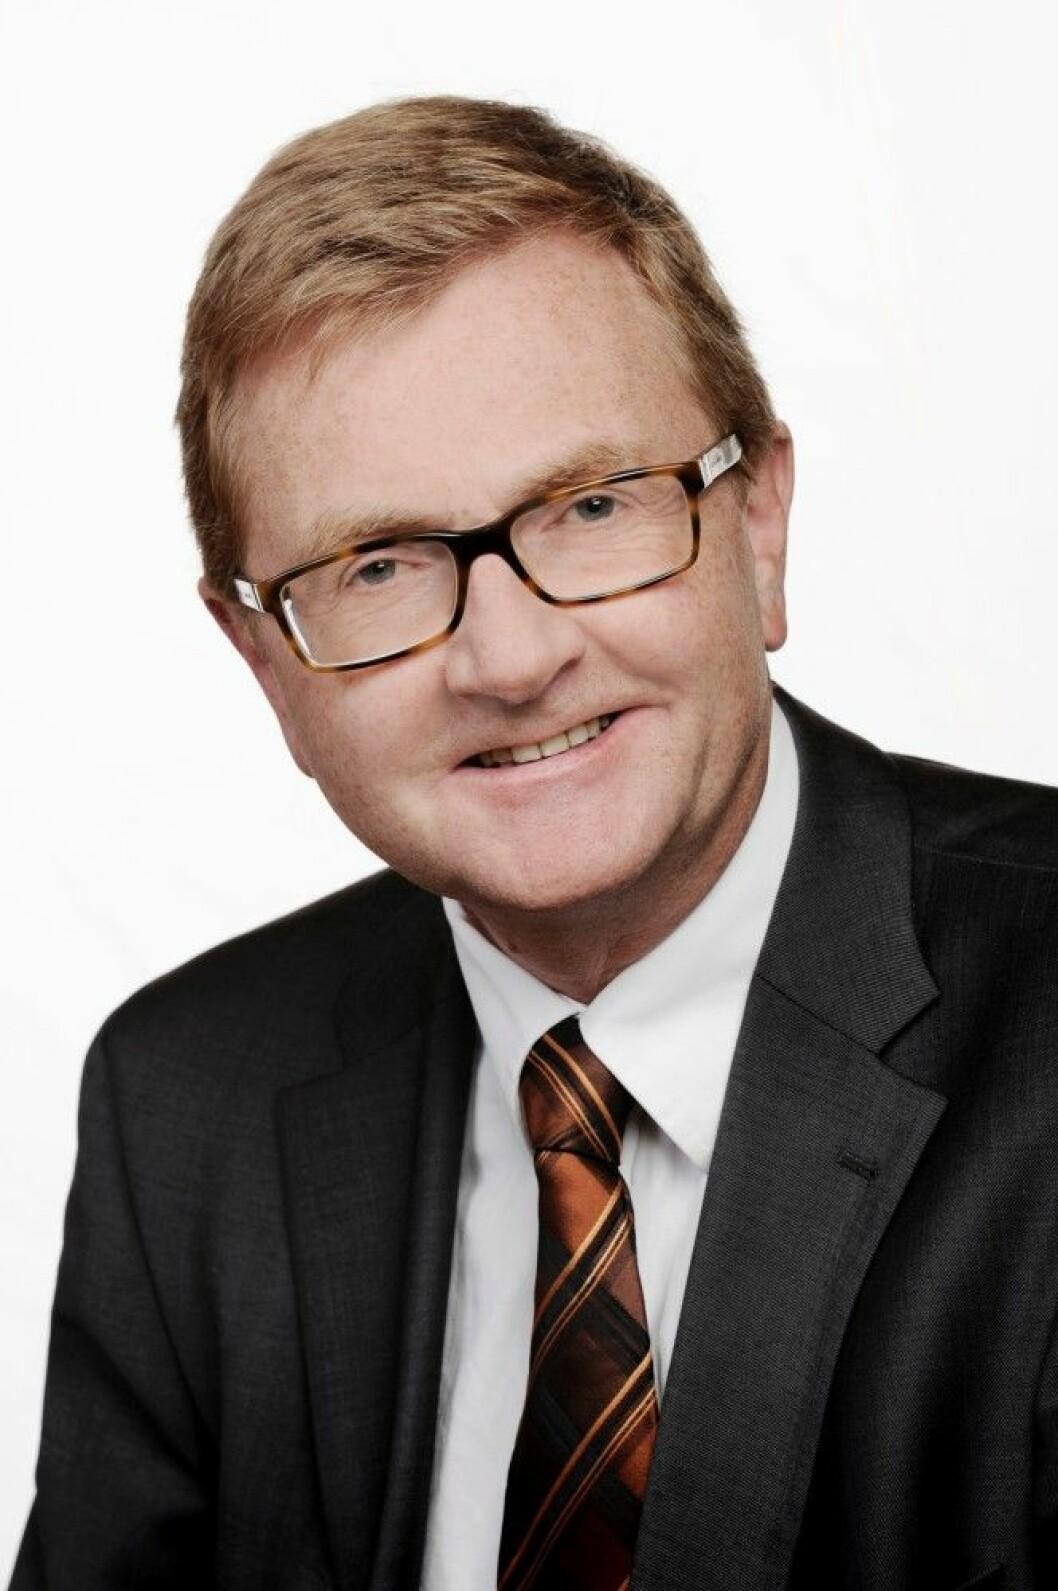 Advokat Fredrik Bie er bostyrer for konkursboet til Johs. Lunde.